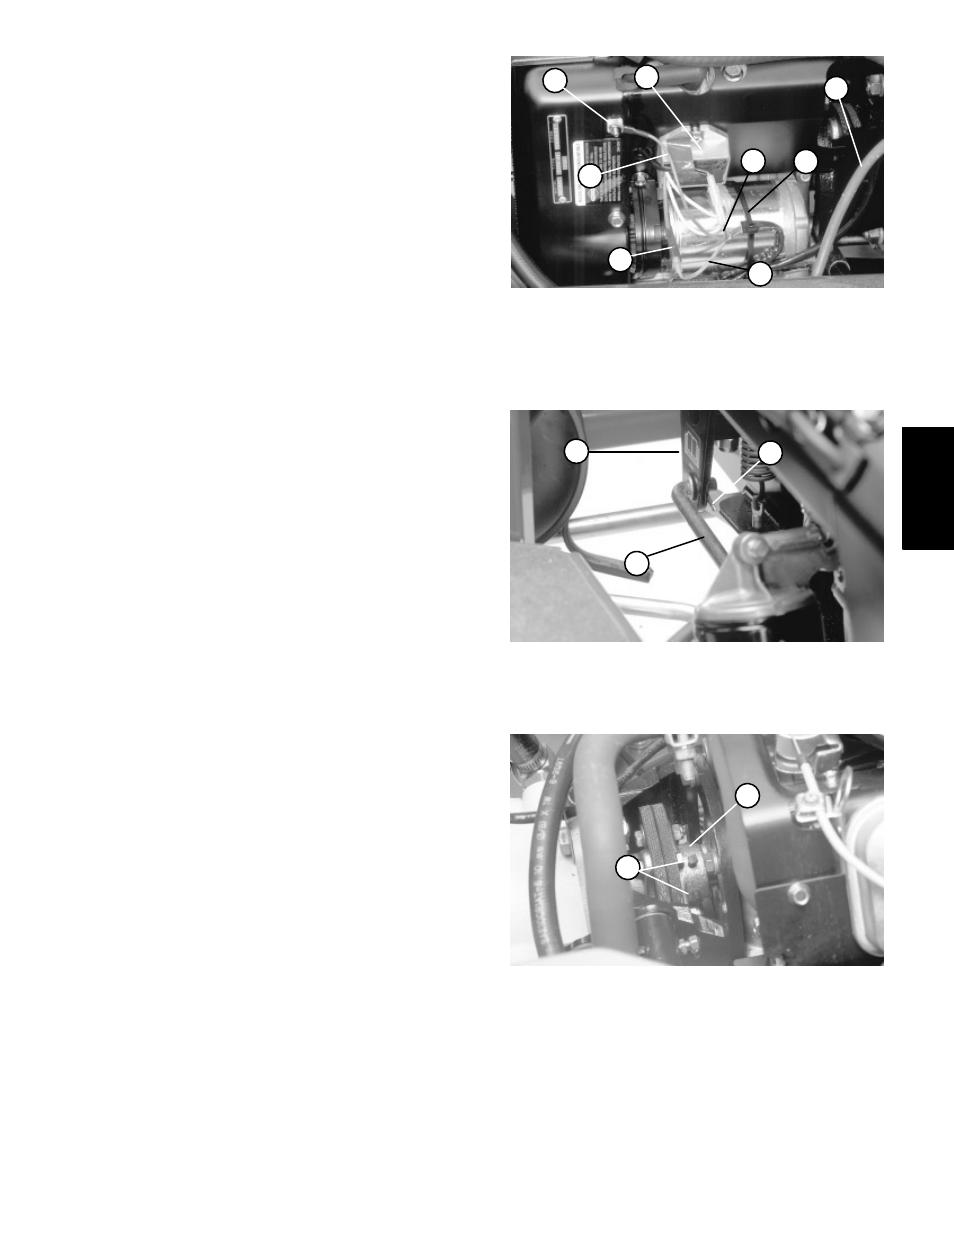 medium resolution of toro sand pro 5020 user manual page 43 170 original modetoro sand pro 5020 user manual